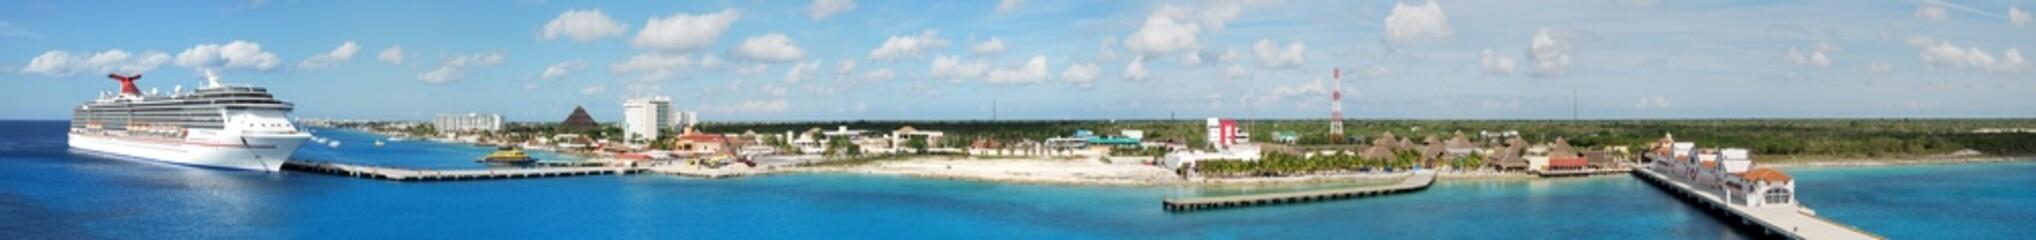 Cozumel Island Panorama